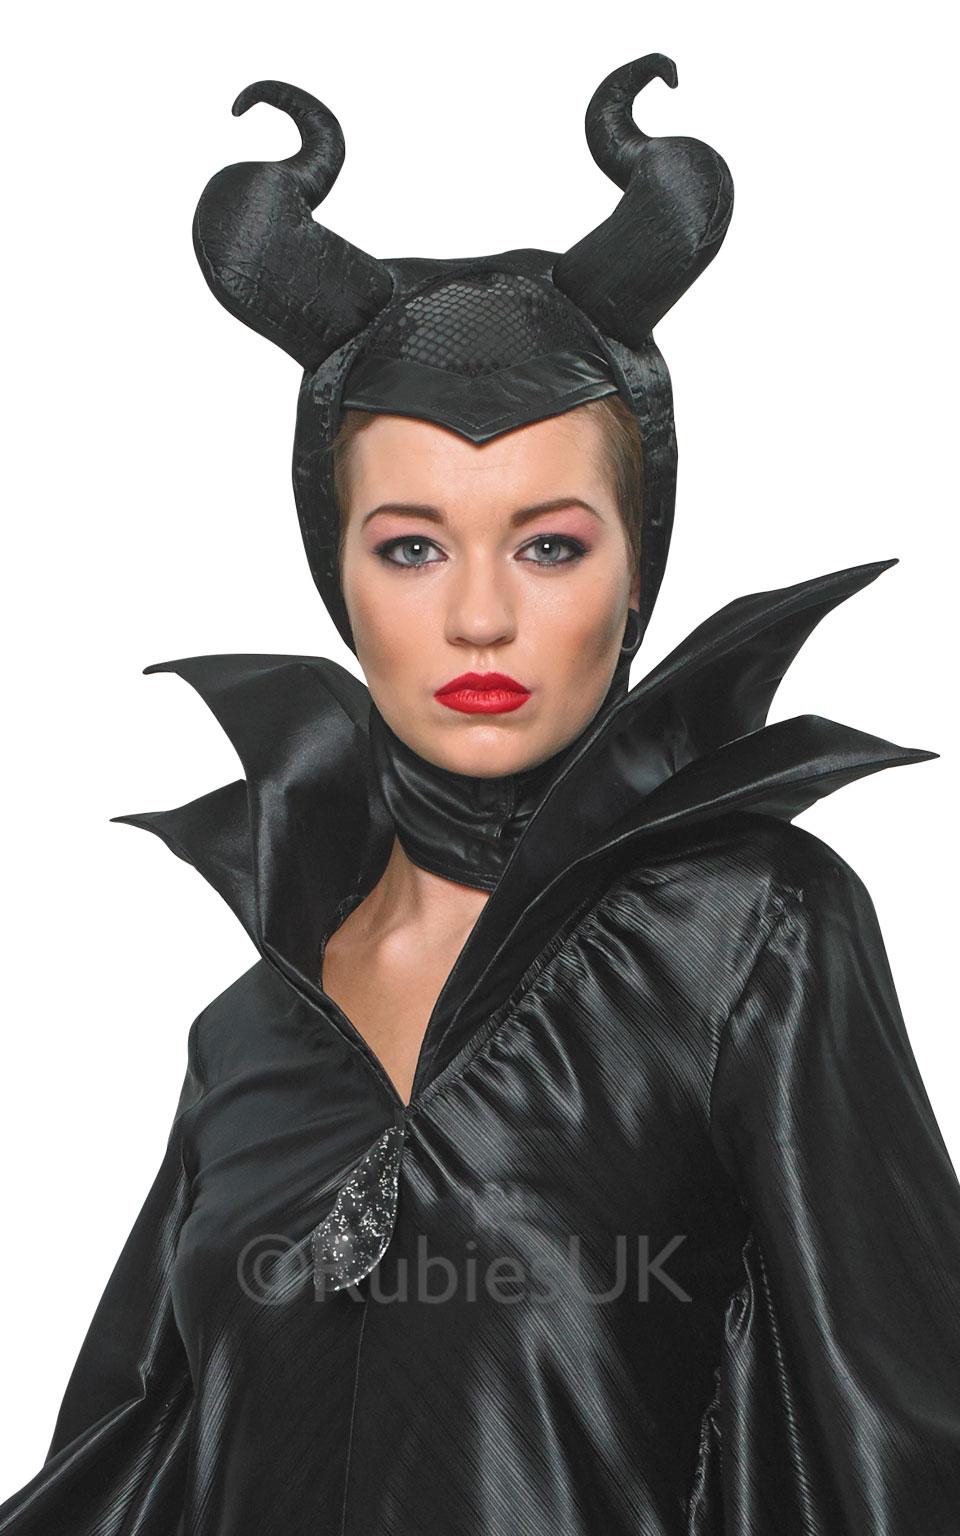 Maleficent Costume Headpiece Accessory